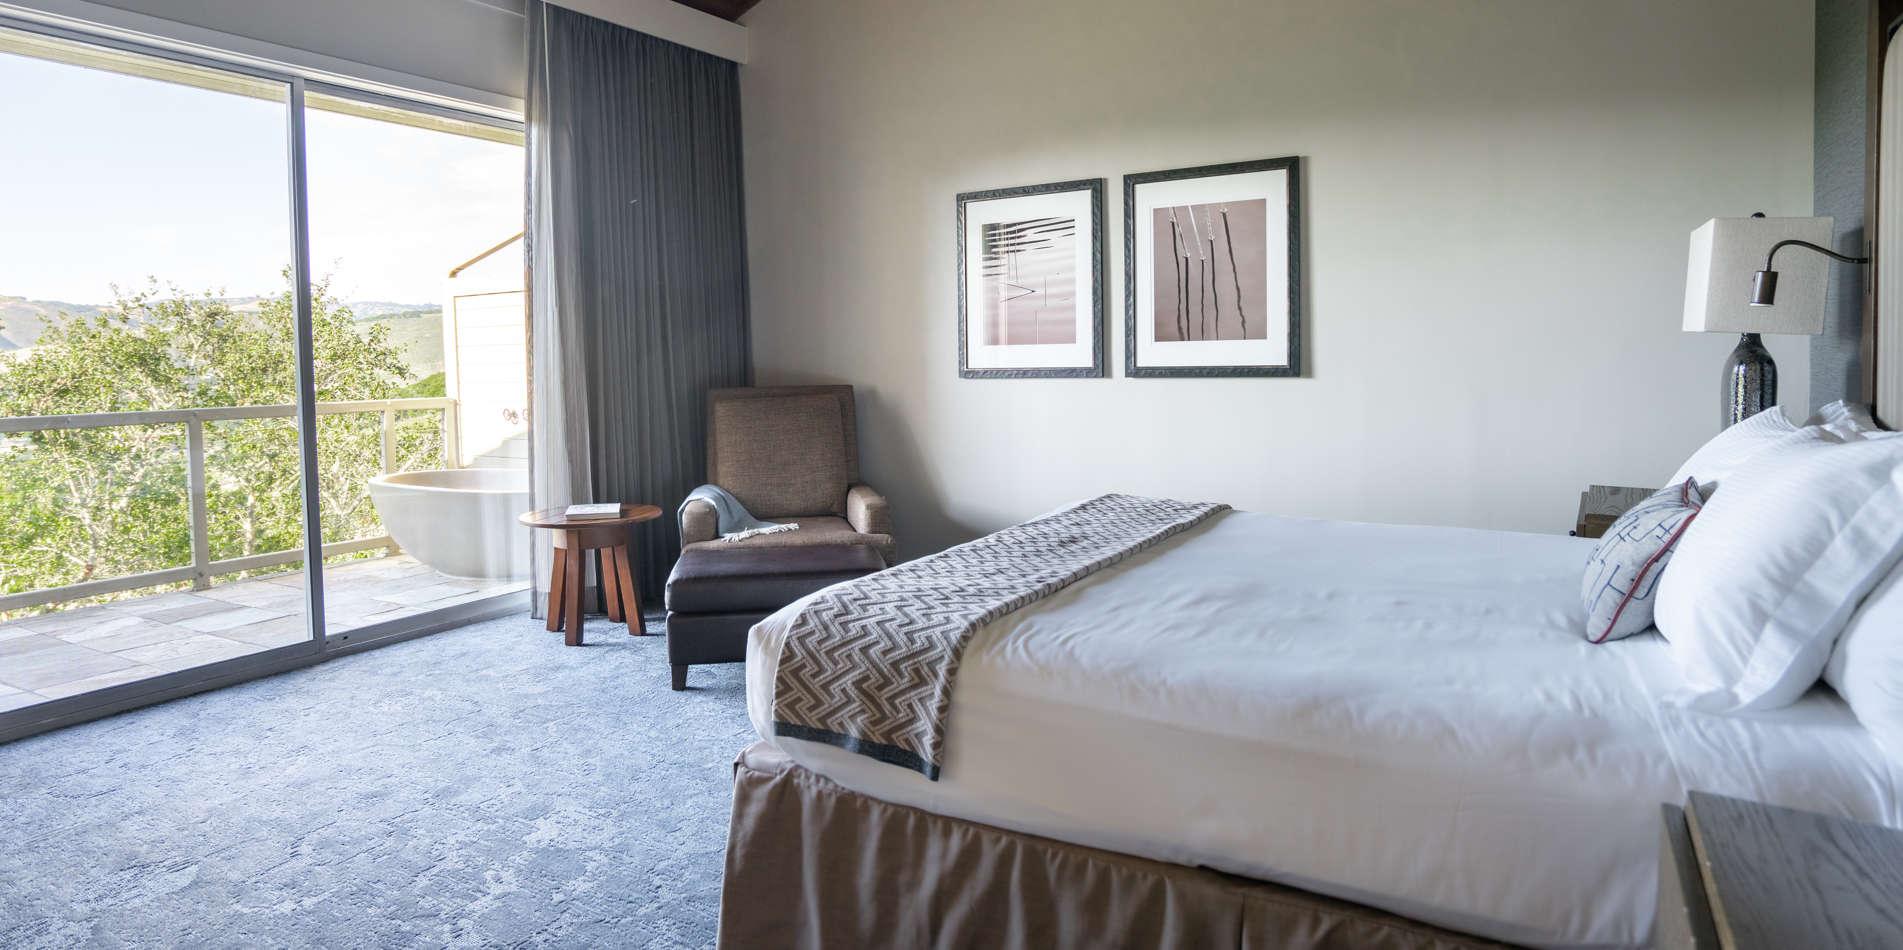 Carmel Valley Ranch_Accommodations_Ranch King_Outdoor Tub_Bedroom_326_2_CR